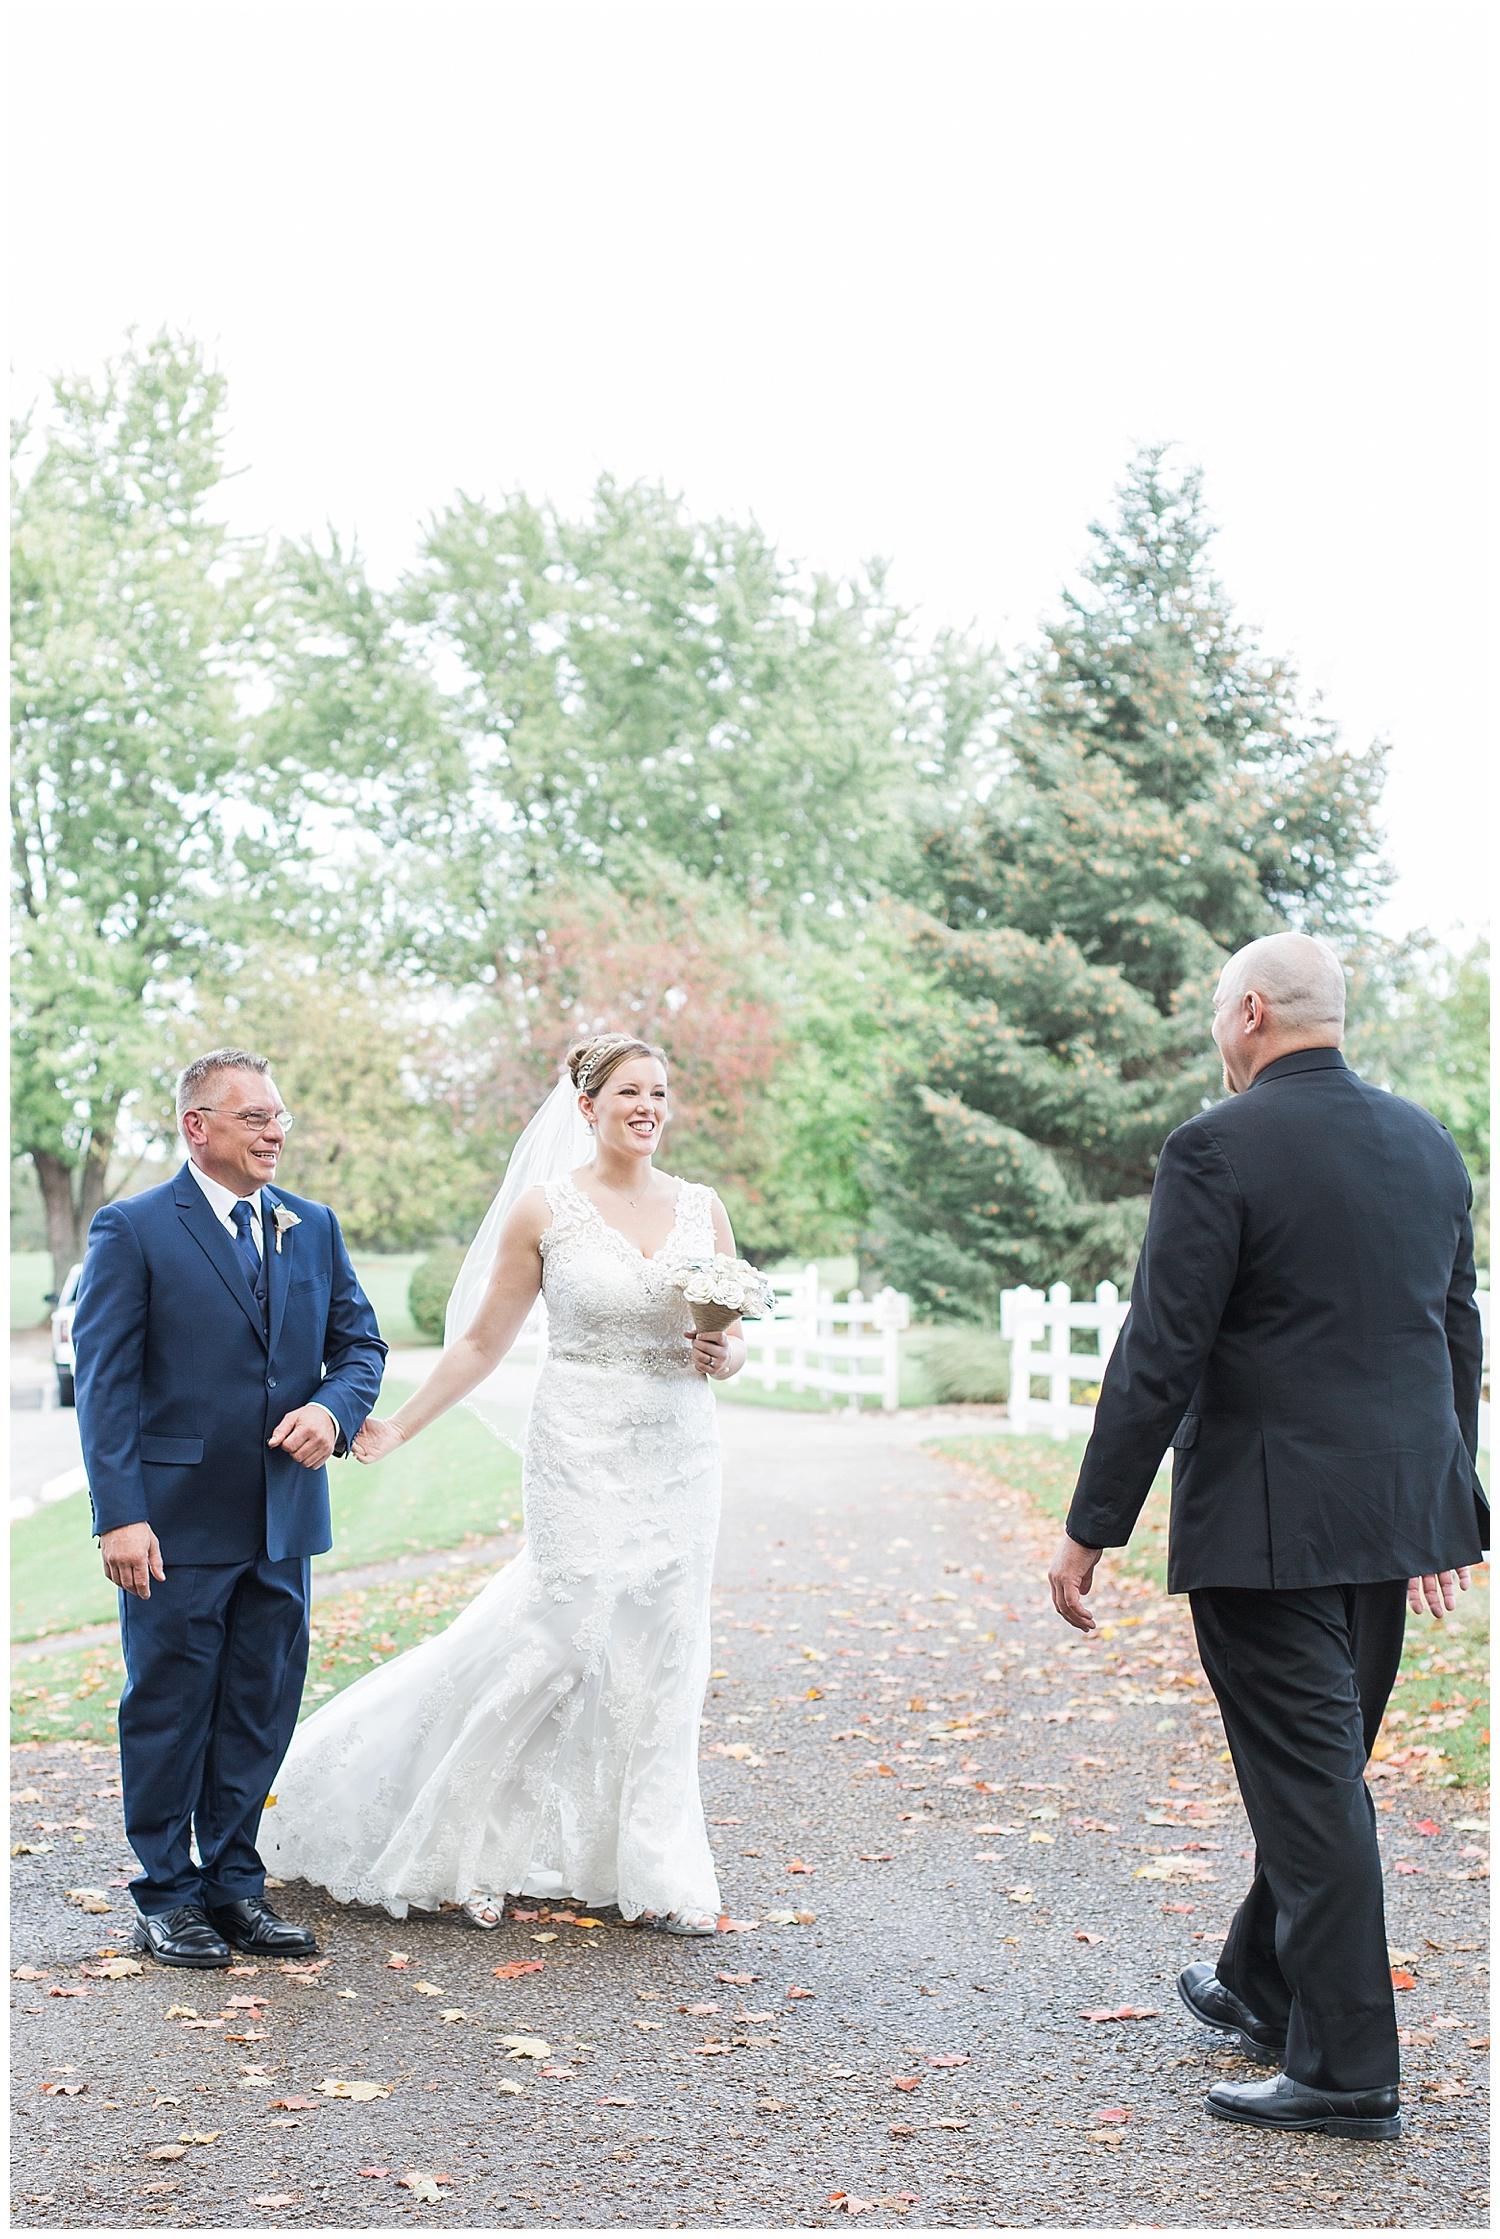 Jessica and Scott McKay - Terry Hills Golf Course - Batavia NY - Lass and Beau-12_Buffalo wedding photography.jpg